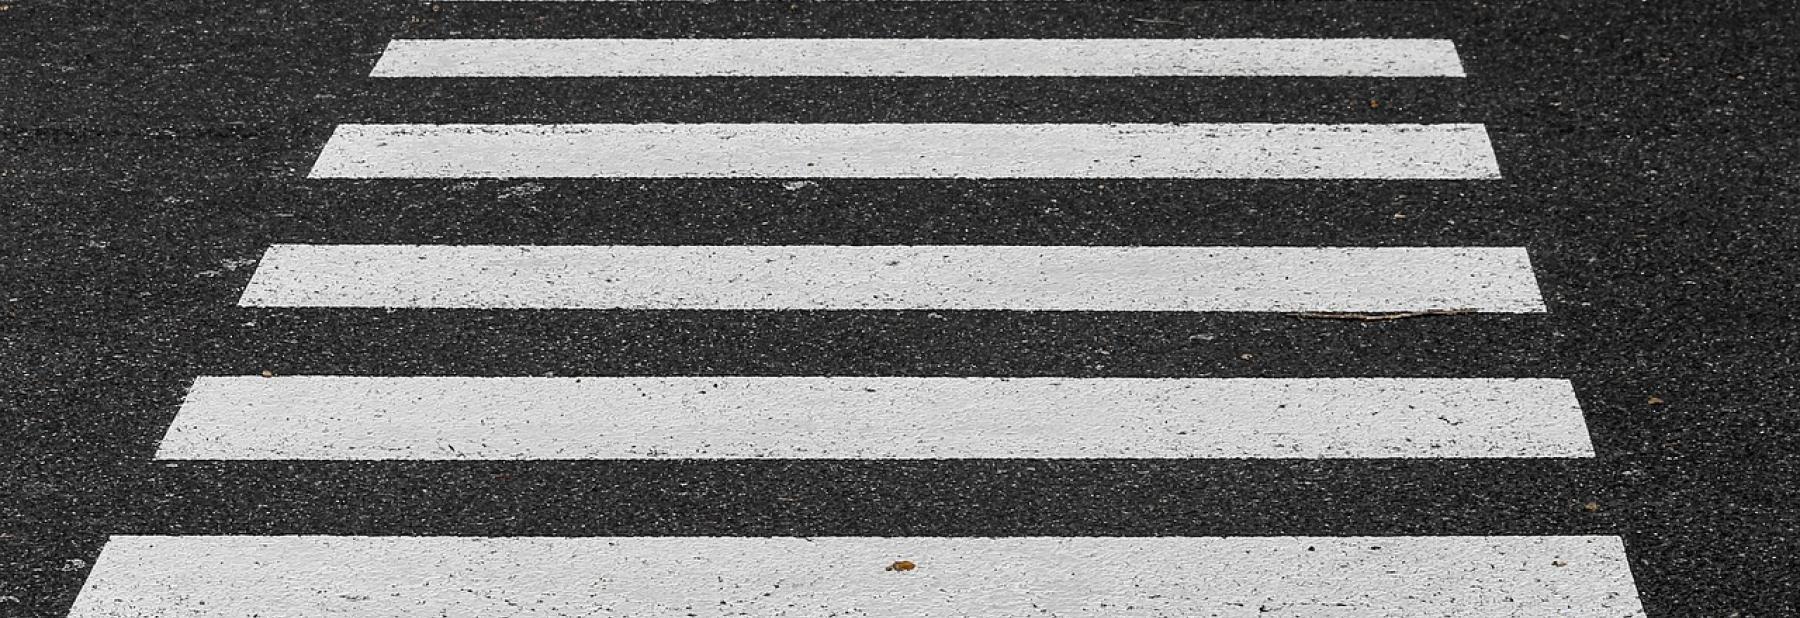 crosswalk-3712127_1280